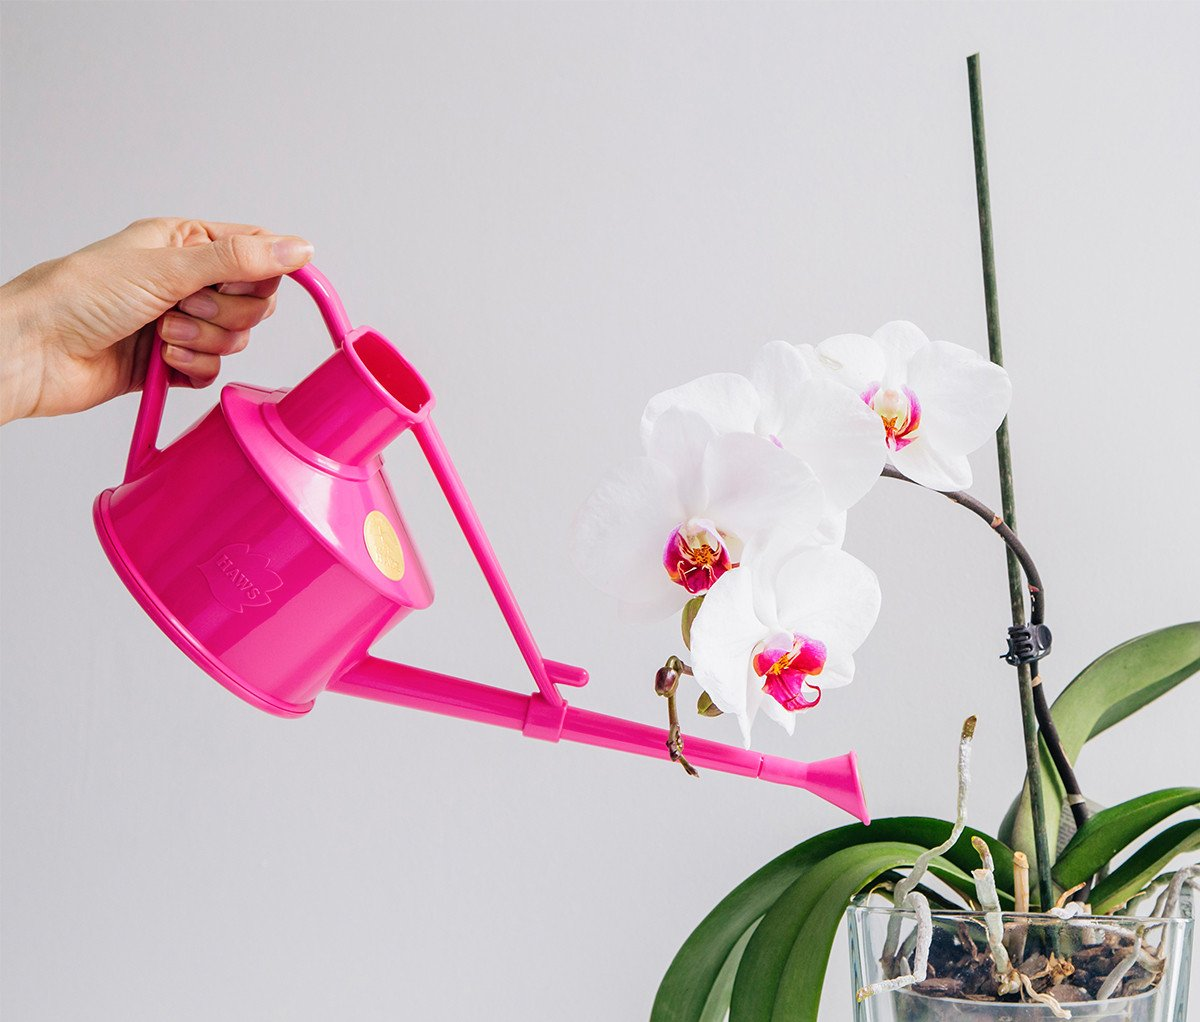 kak-uhazhivat-za-orhidejami-image3 | Как ухаживать за орхидеями